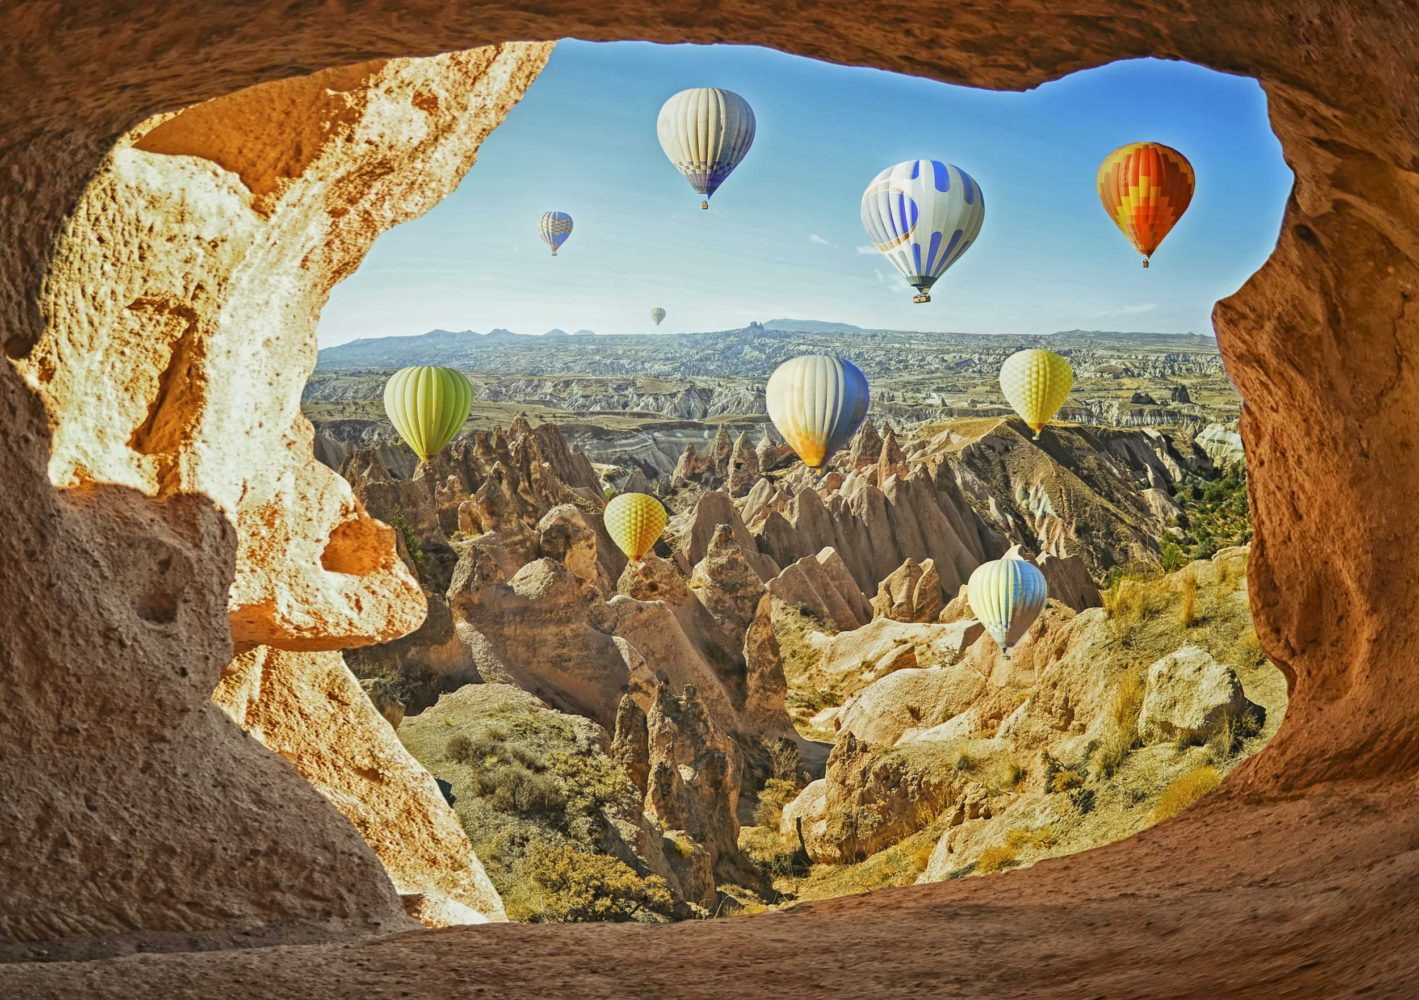 Cappadocia-Balloons-iStock-666480002-maroznc-1419x1000.jpg